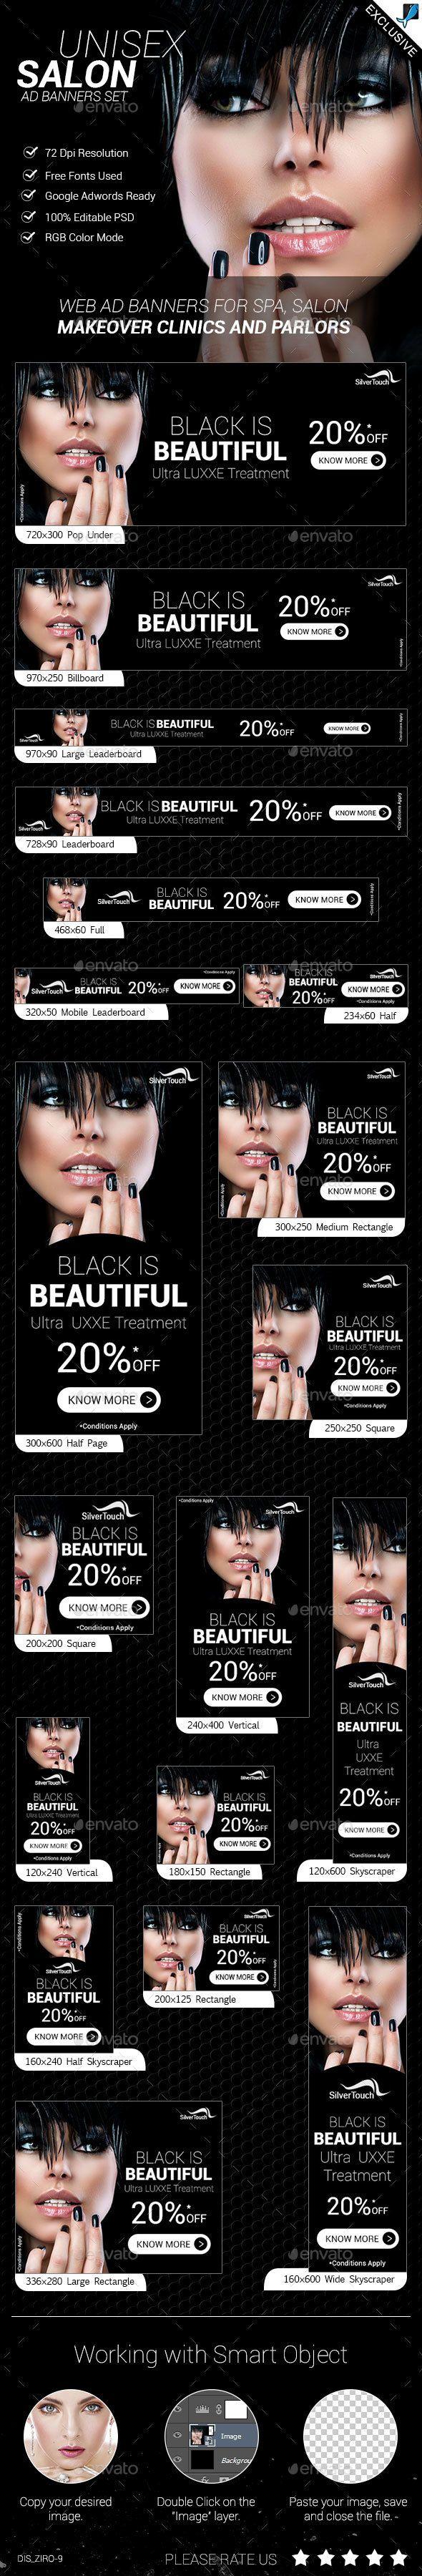 Unisex Salon  Ad Banners Set